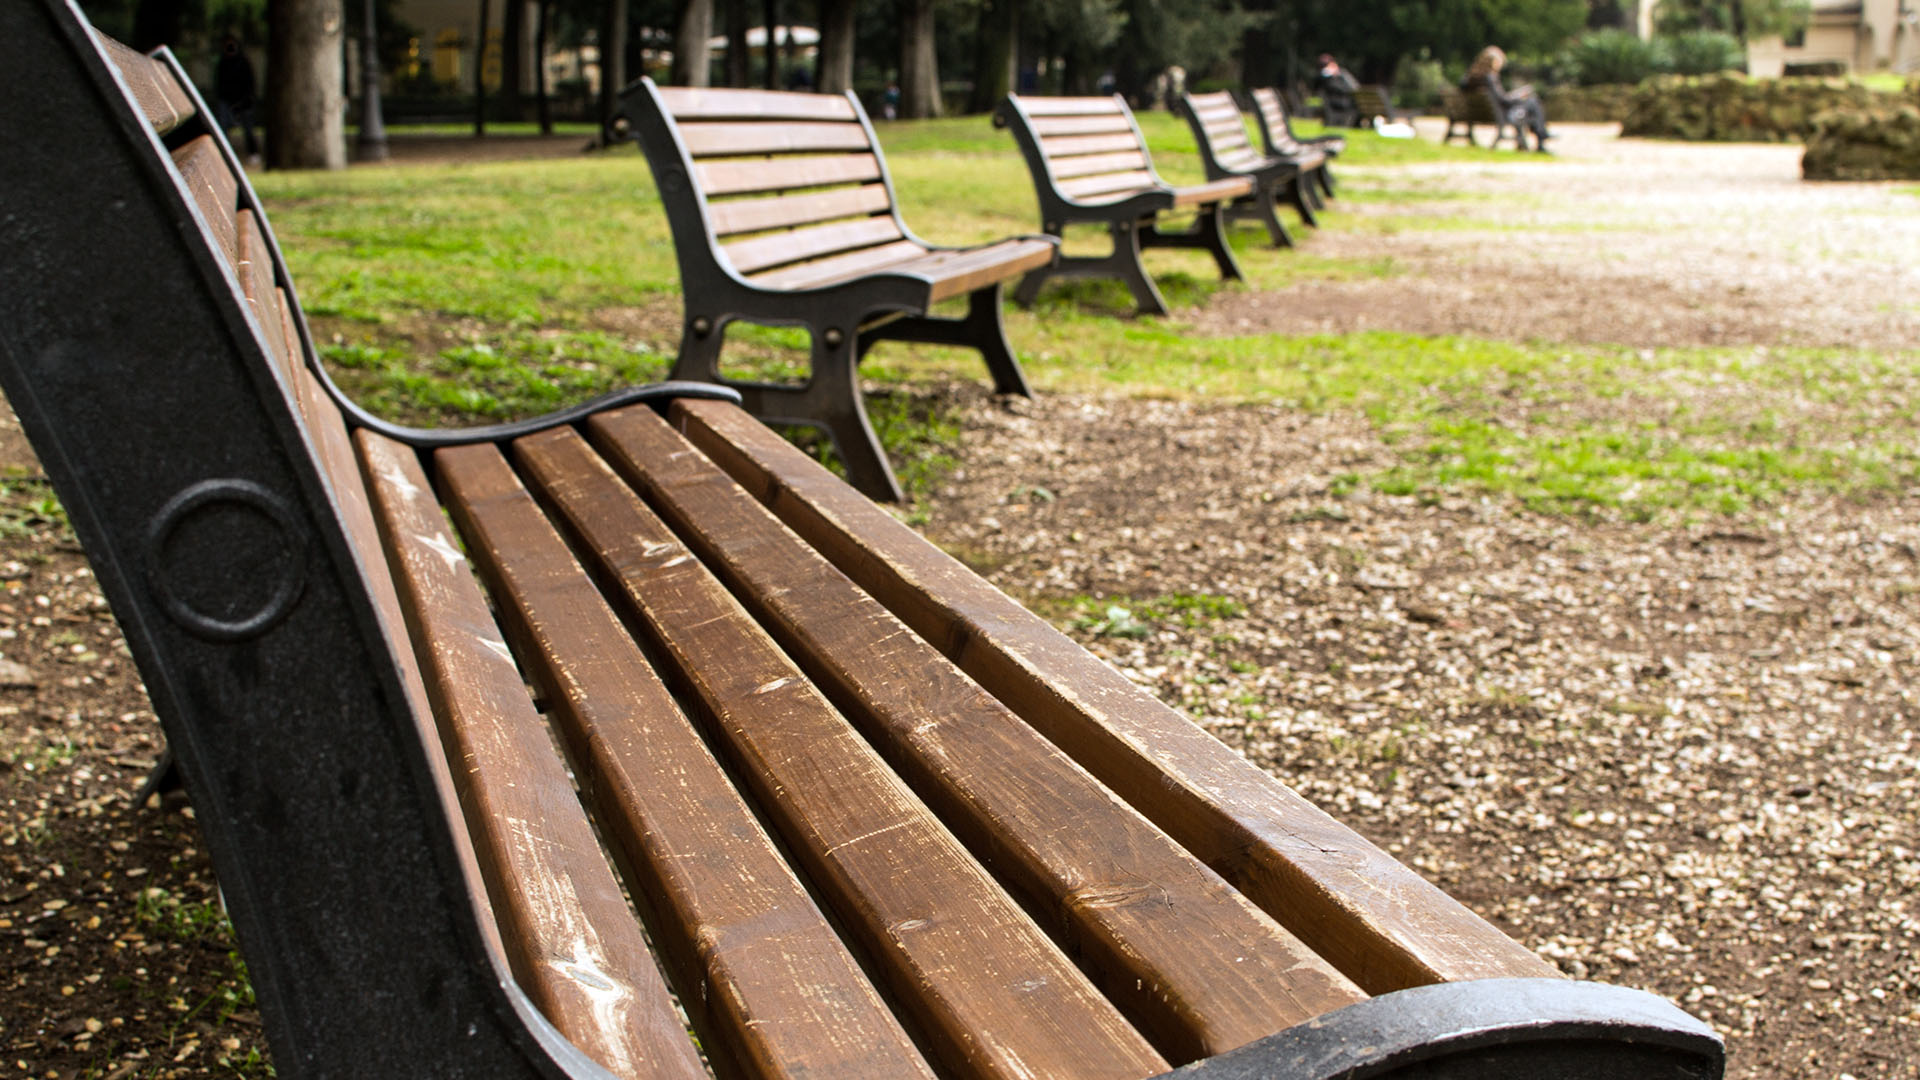 Irollo maurizio arredo urbano giardino e illuminazione for Arredo urbano panchine